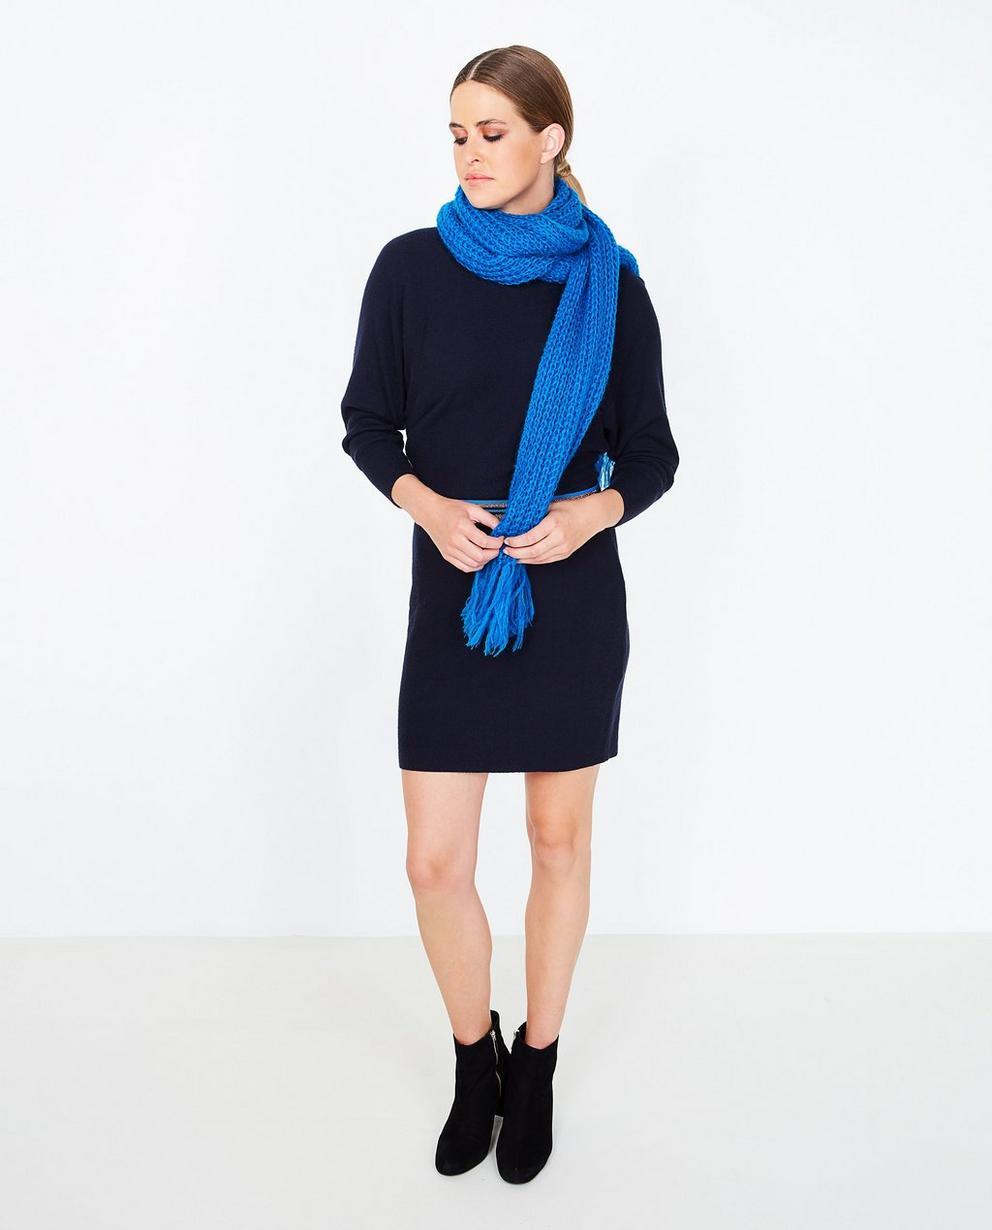 Robe en fin tricot - bleu nuit, Youh! - YOUH!